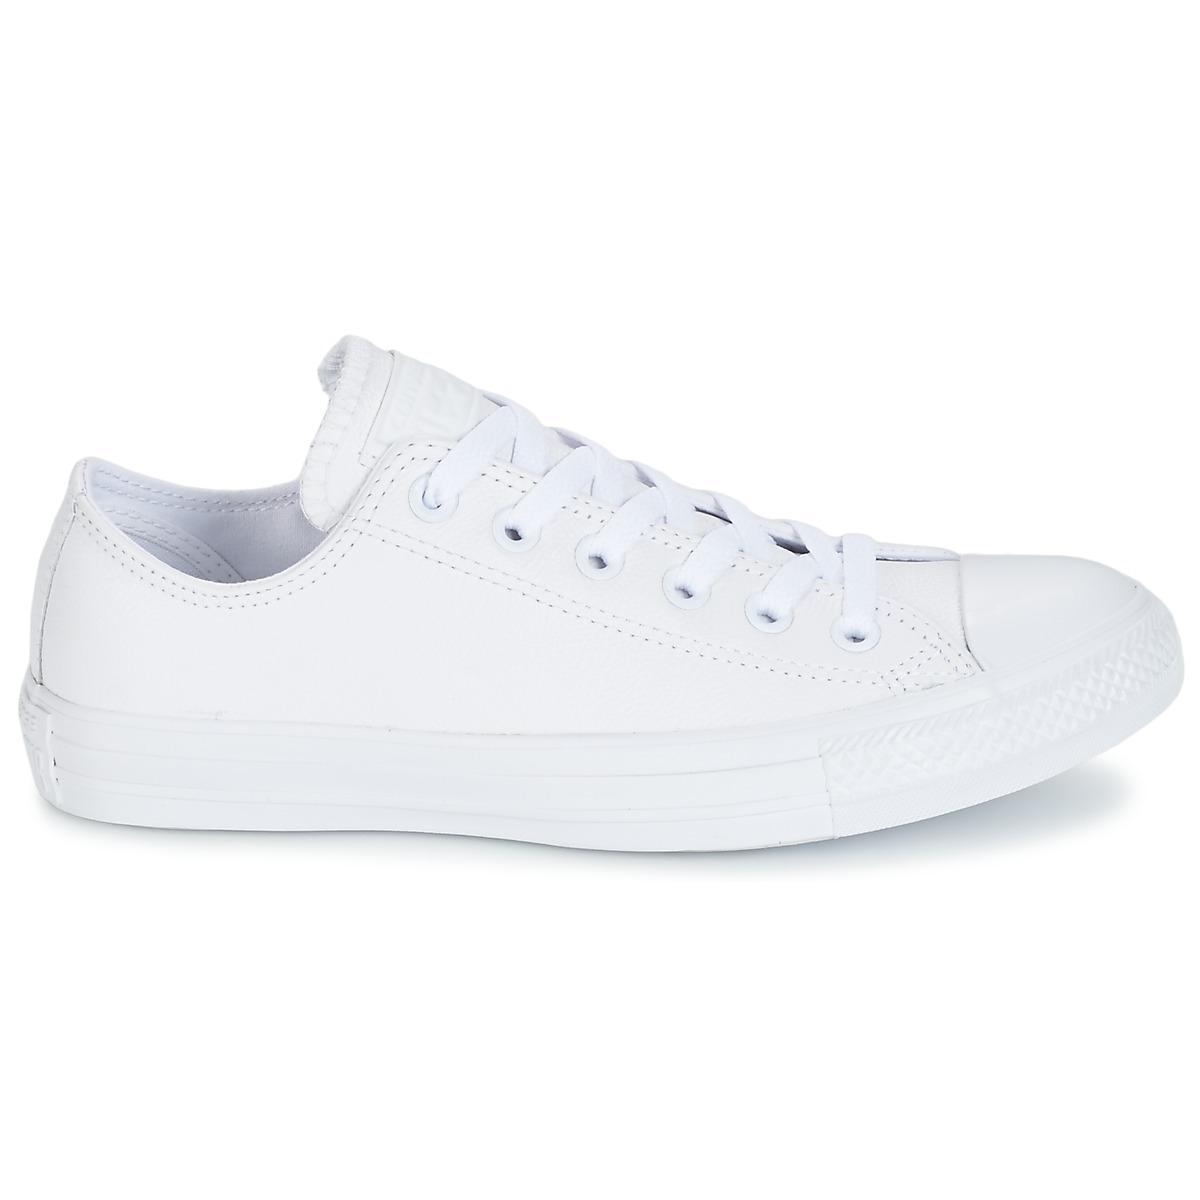 3f53e85a68bd07 Converse - All Star Monochrome Cuir Ox Women s Shoes (trainers) In White -  Lyst. View fullscreen